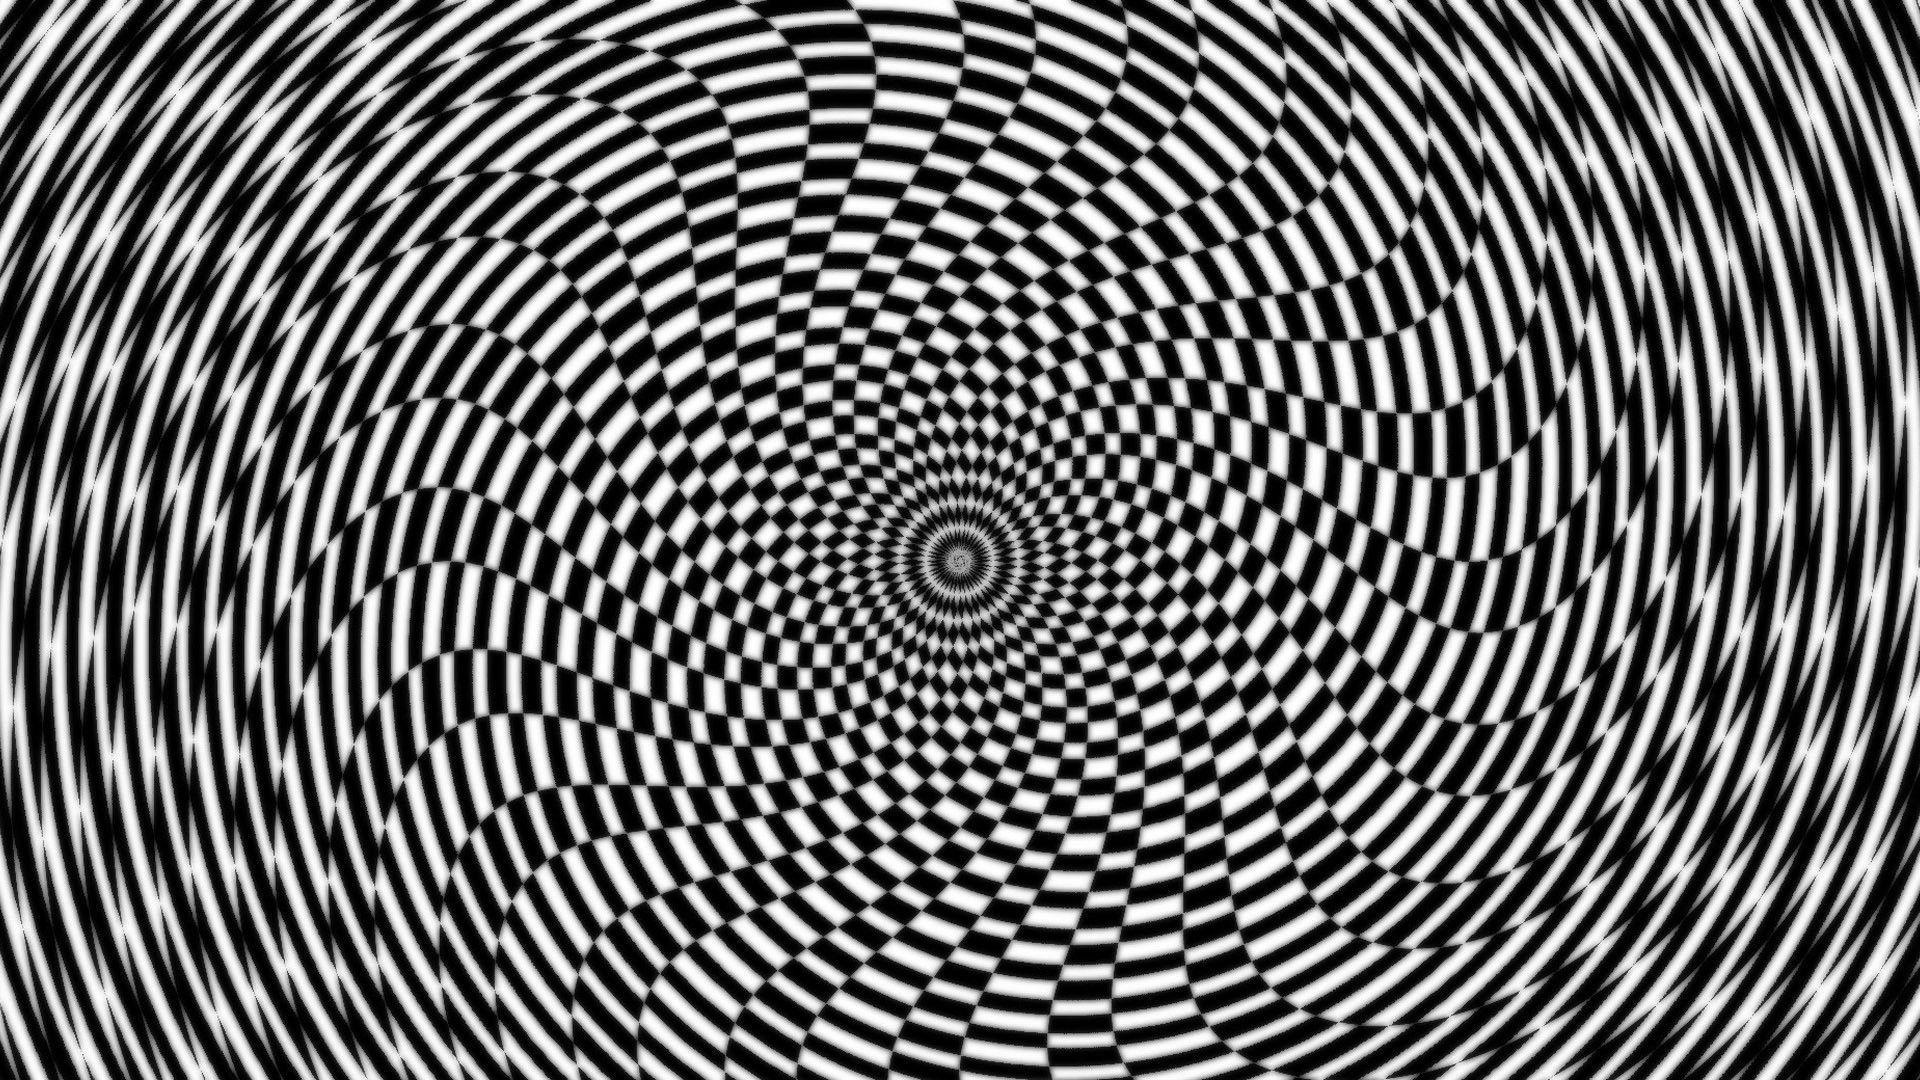 Photos illusion car moving optical illusion spectacular optical - Optical Illusion Desktop Wallpaper